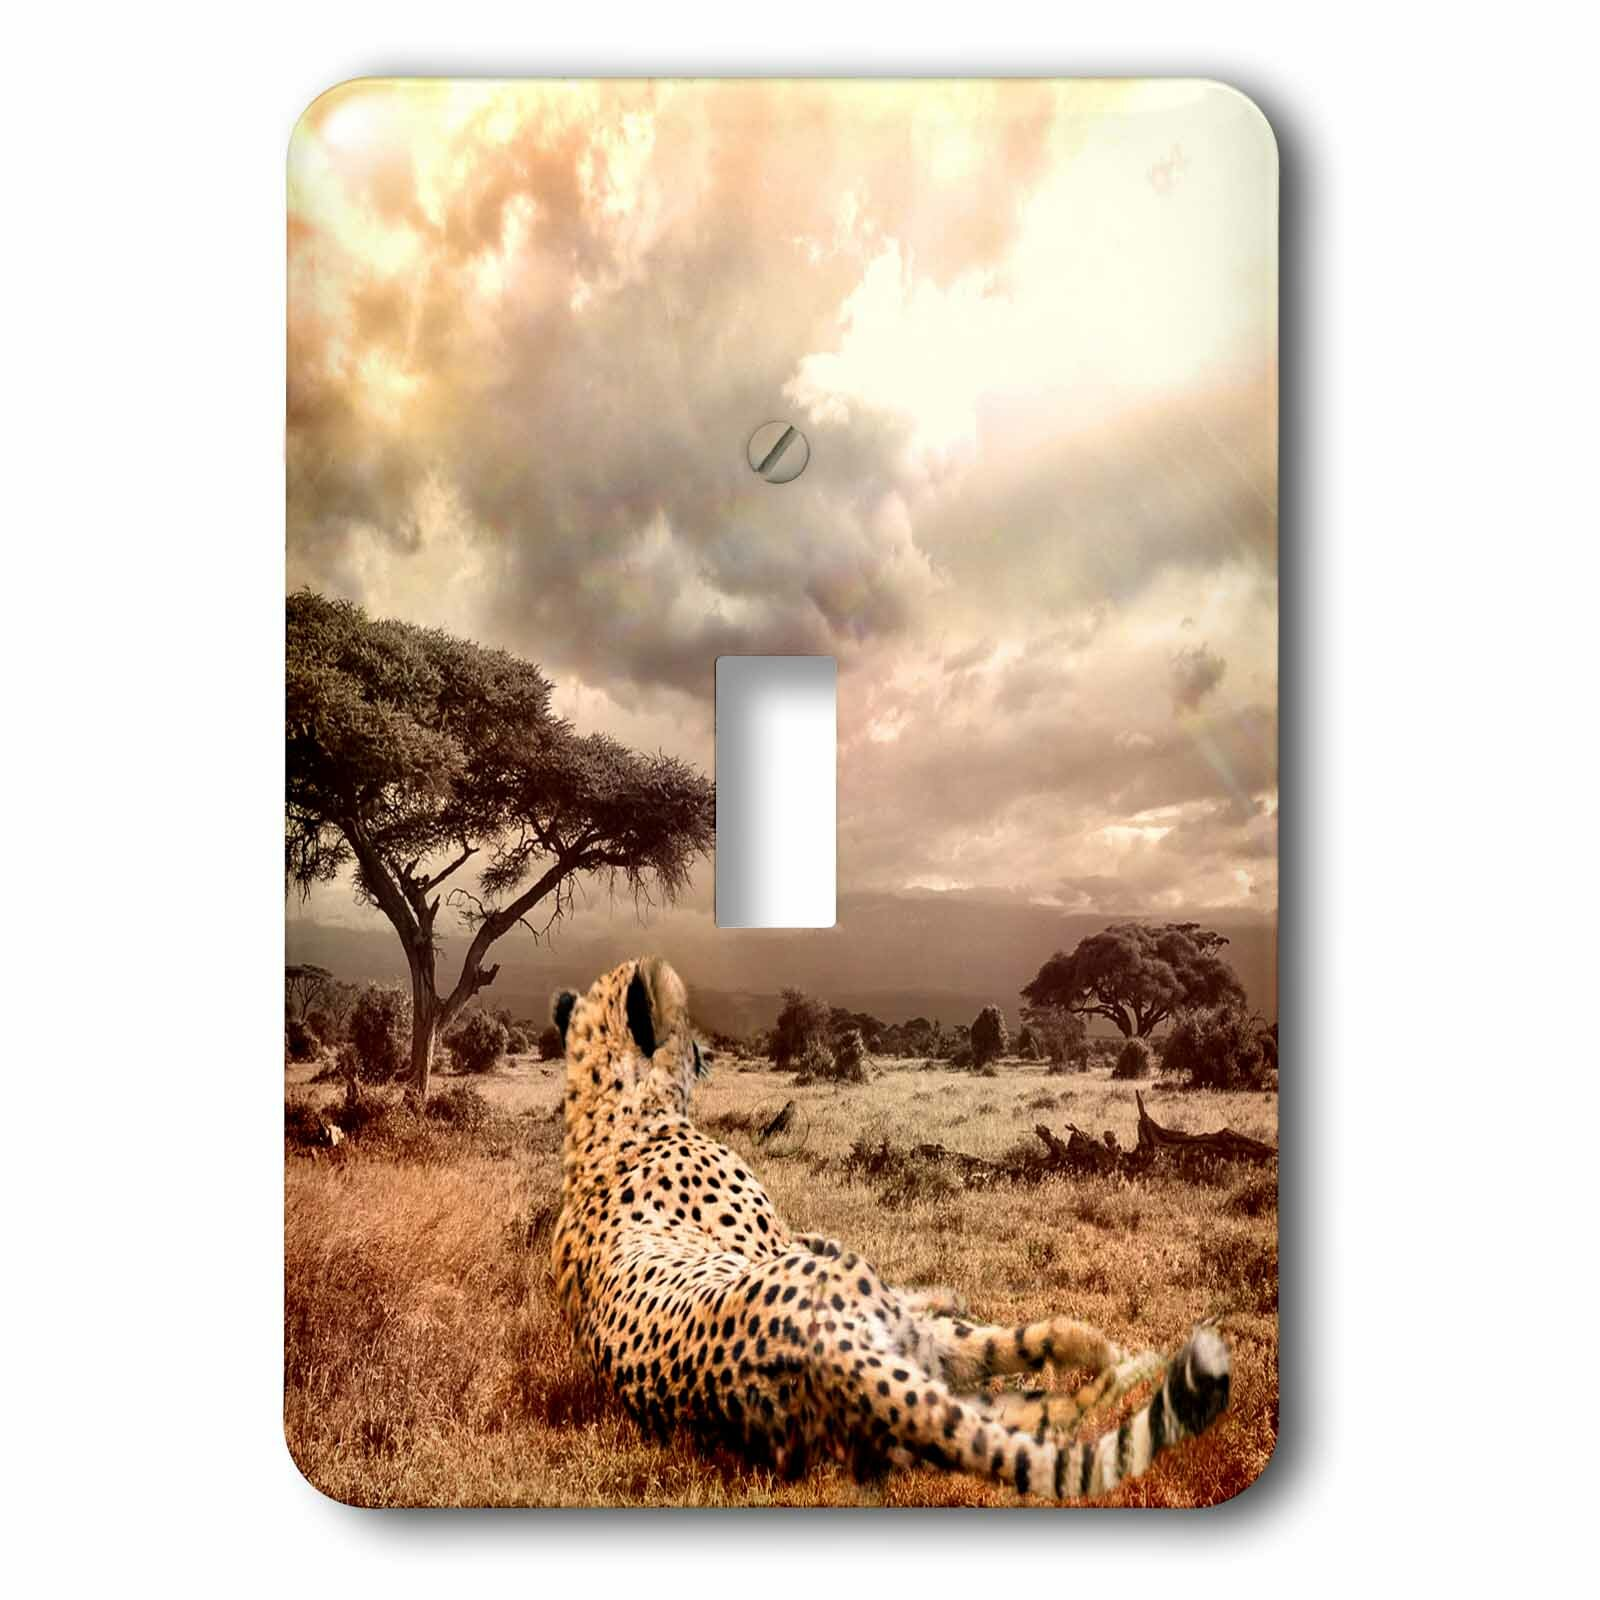 3drose Cheetah African Wildcat 1 Gang Toggle Light Switch Wall Plate Wayfair